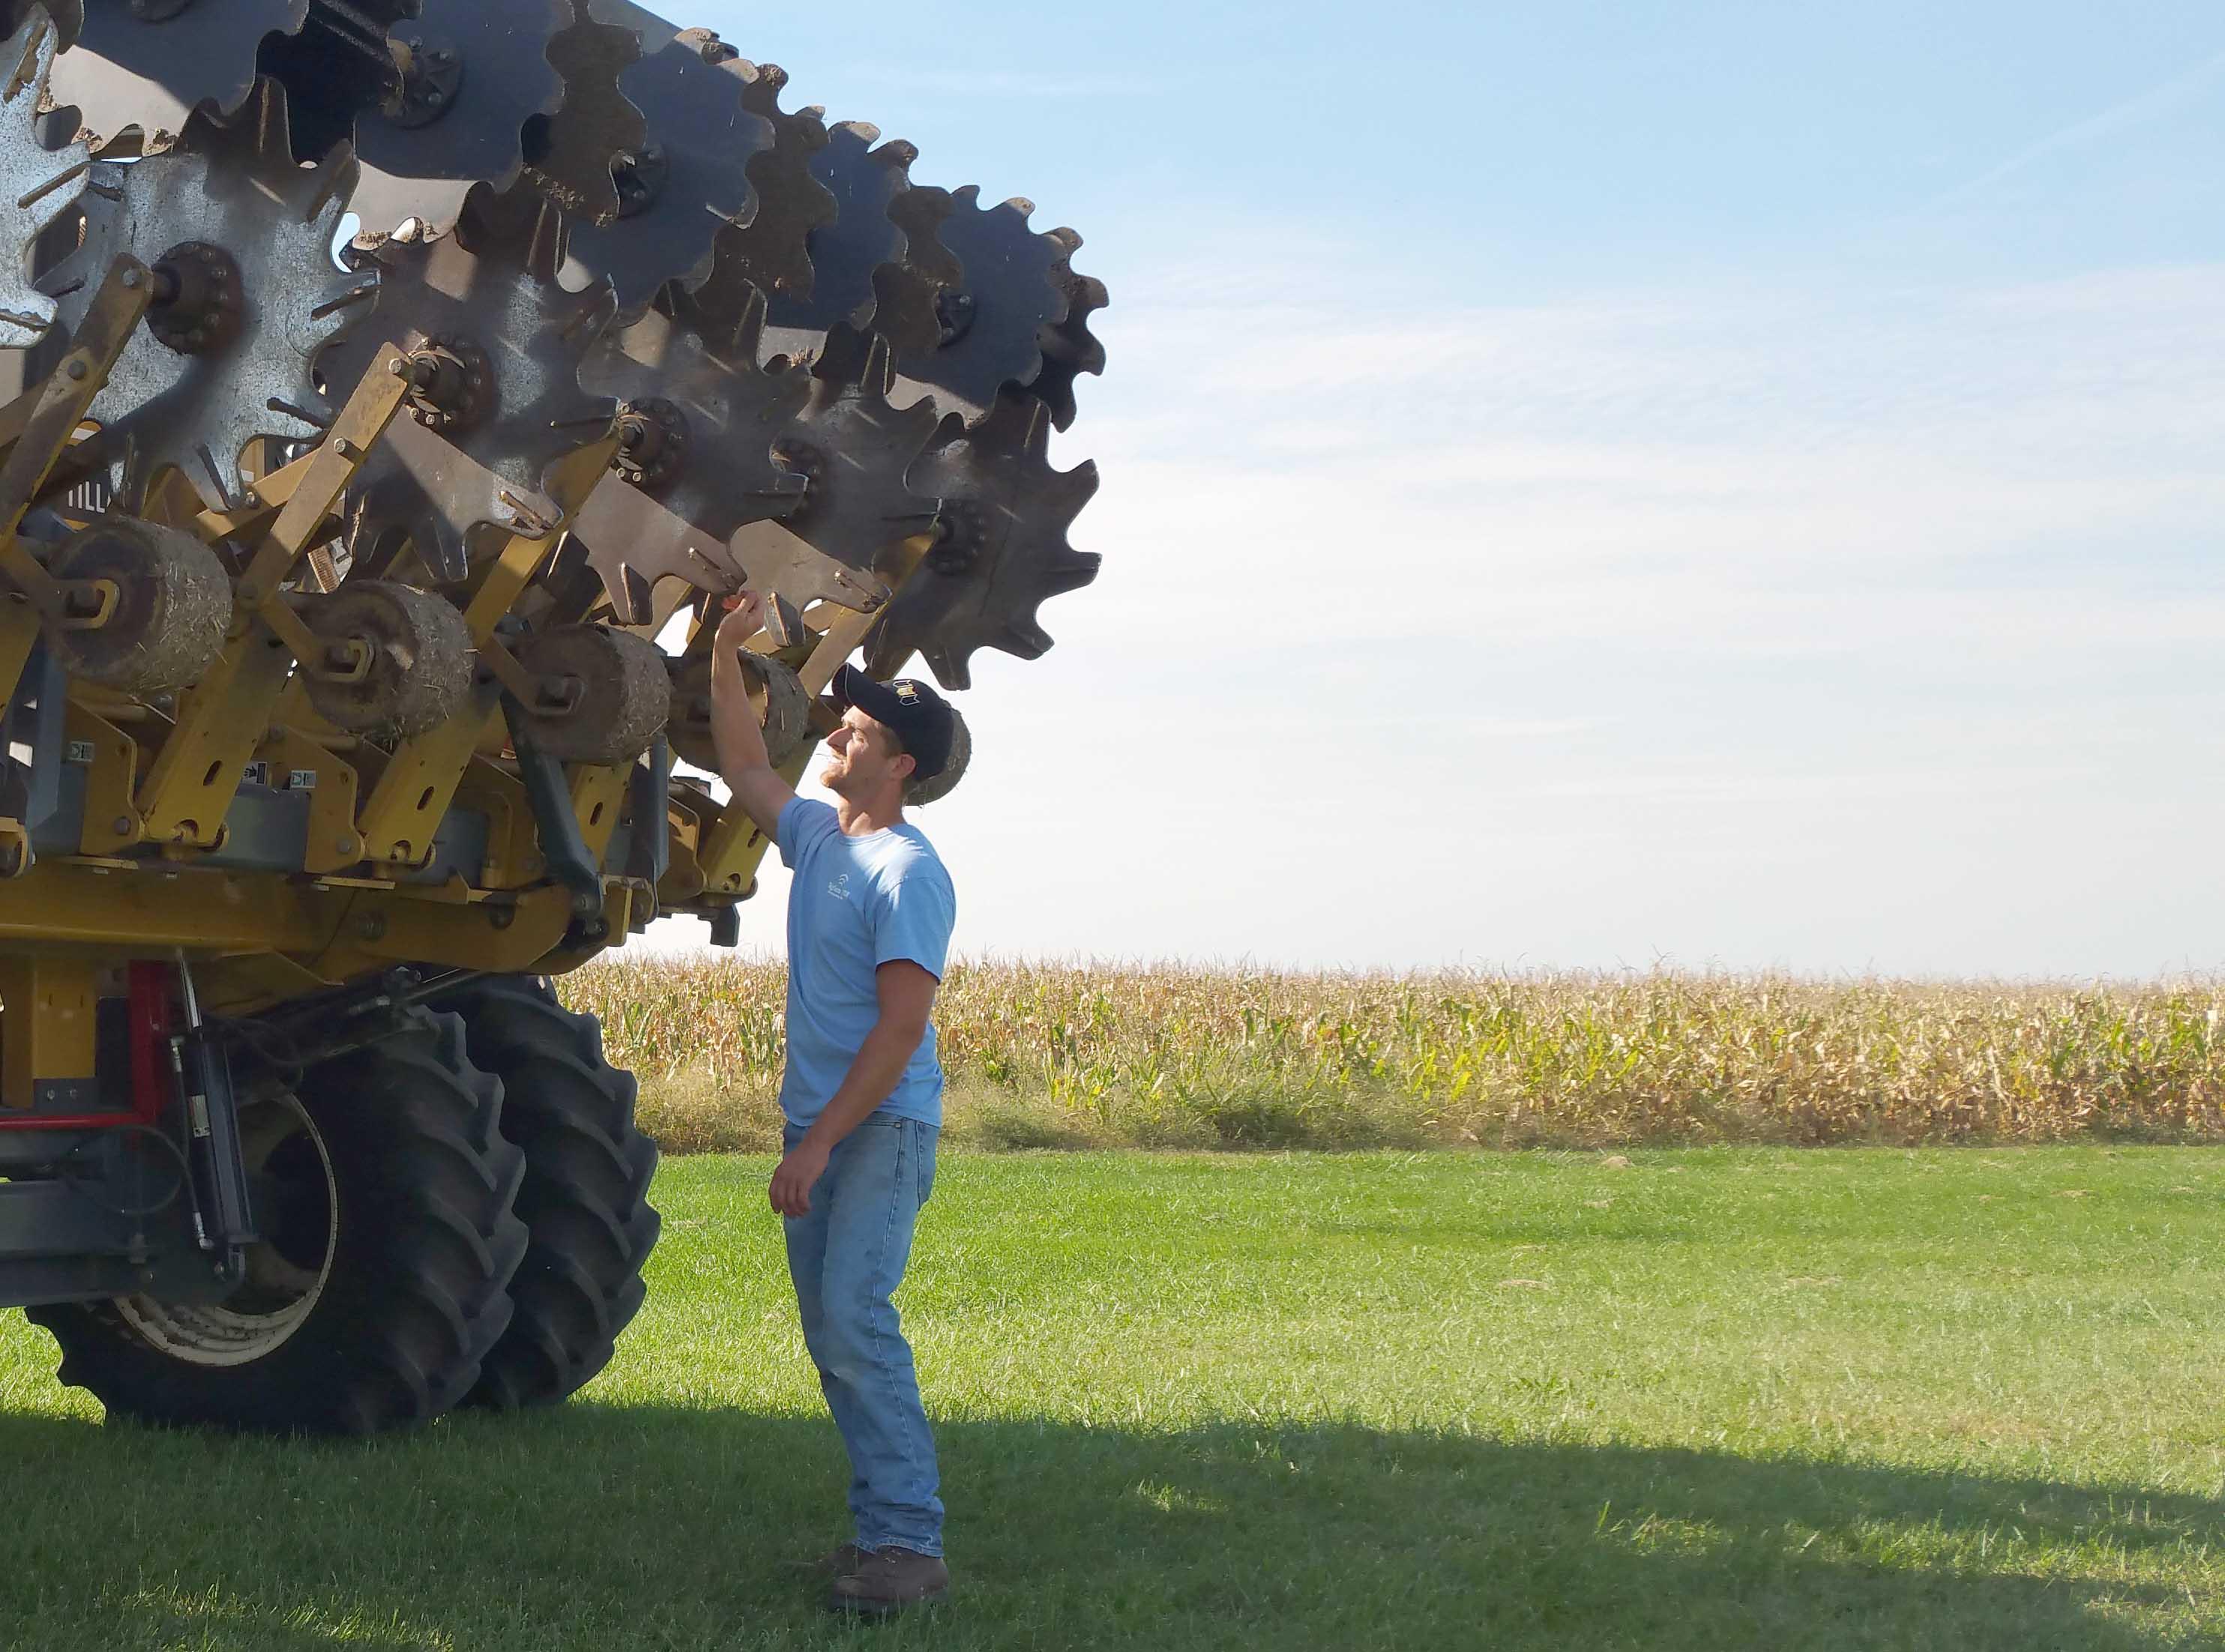 Dave Delhotal inspects SoilWarrior